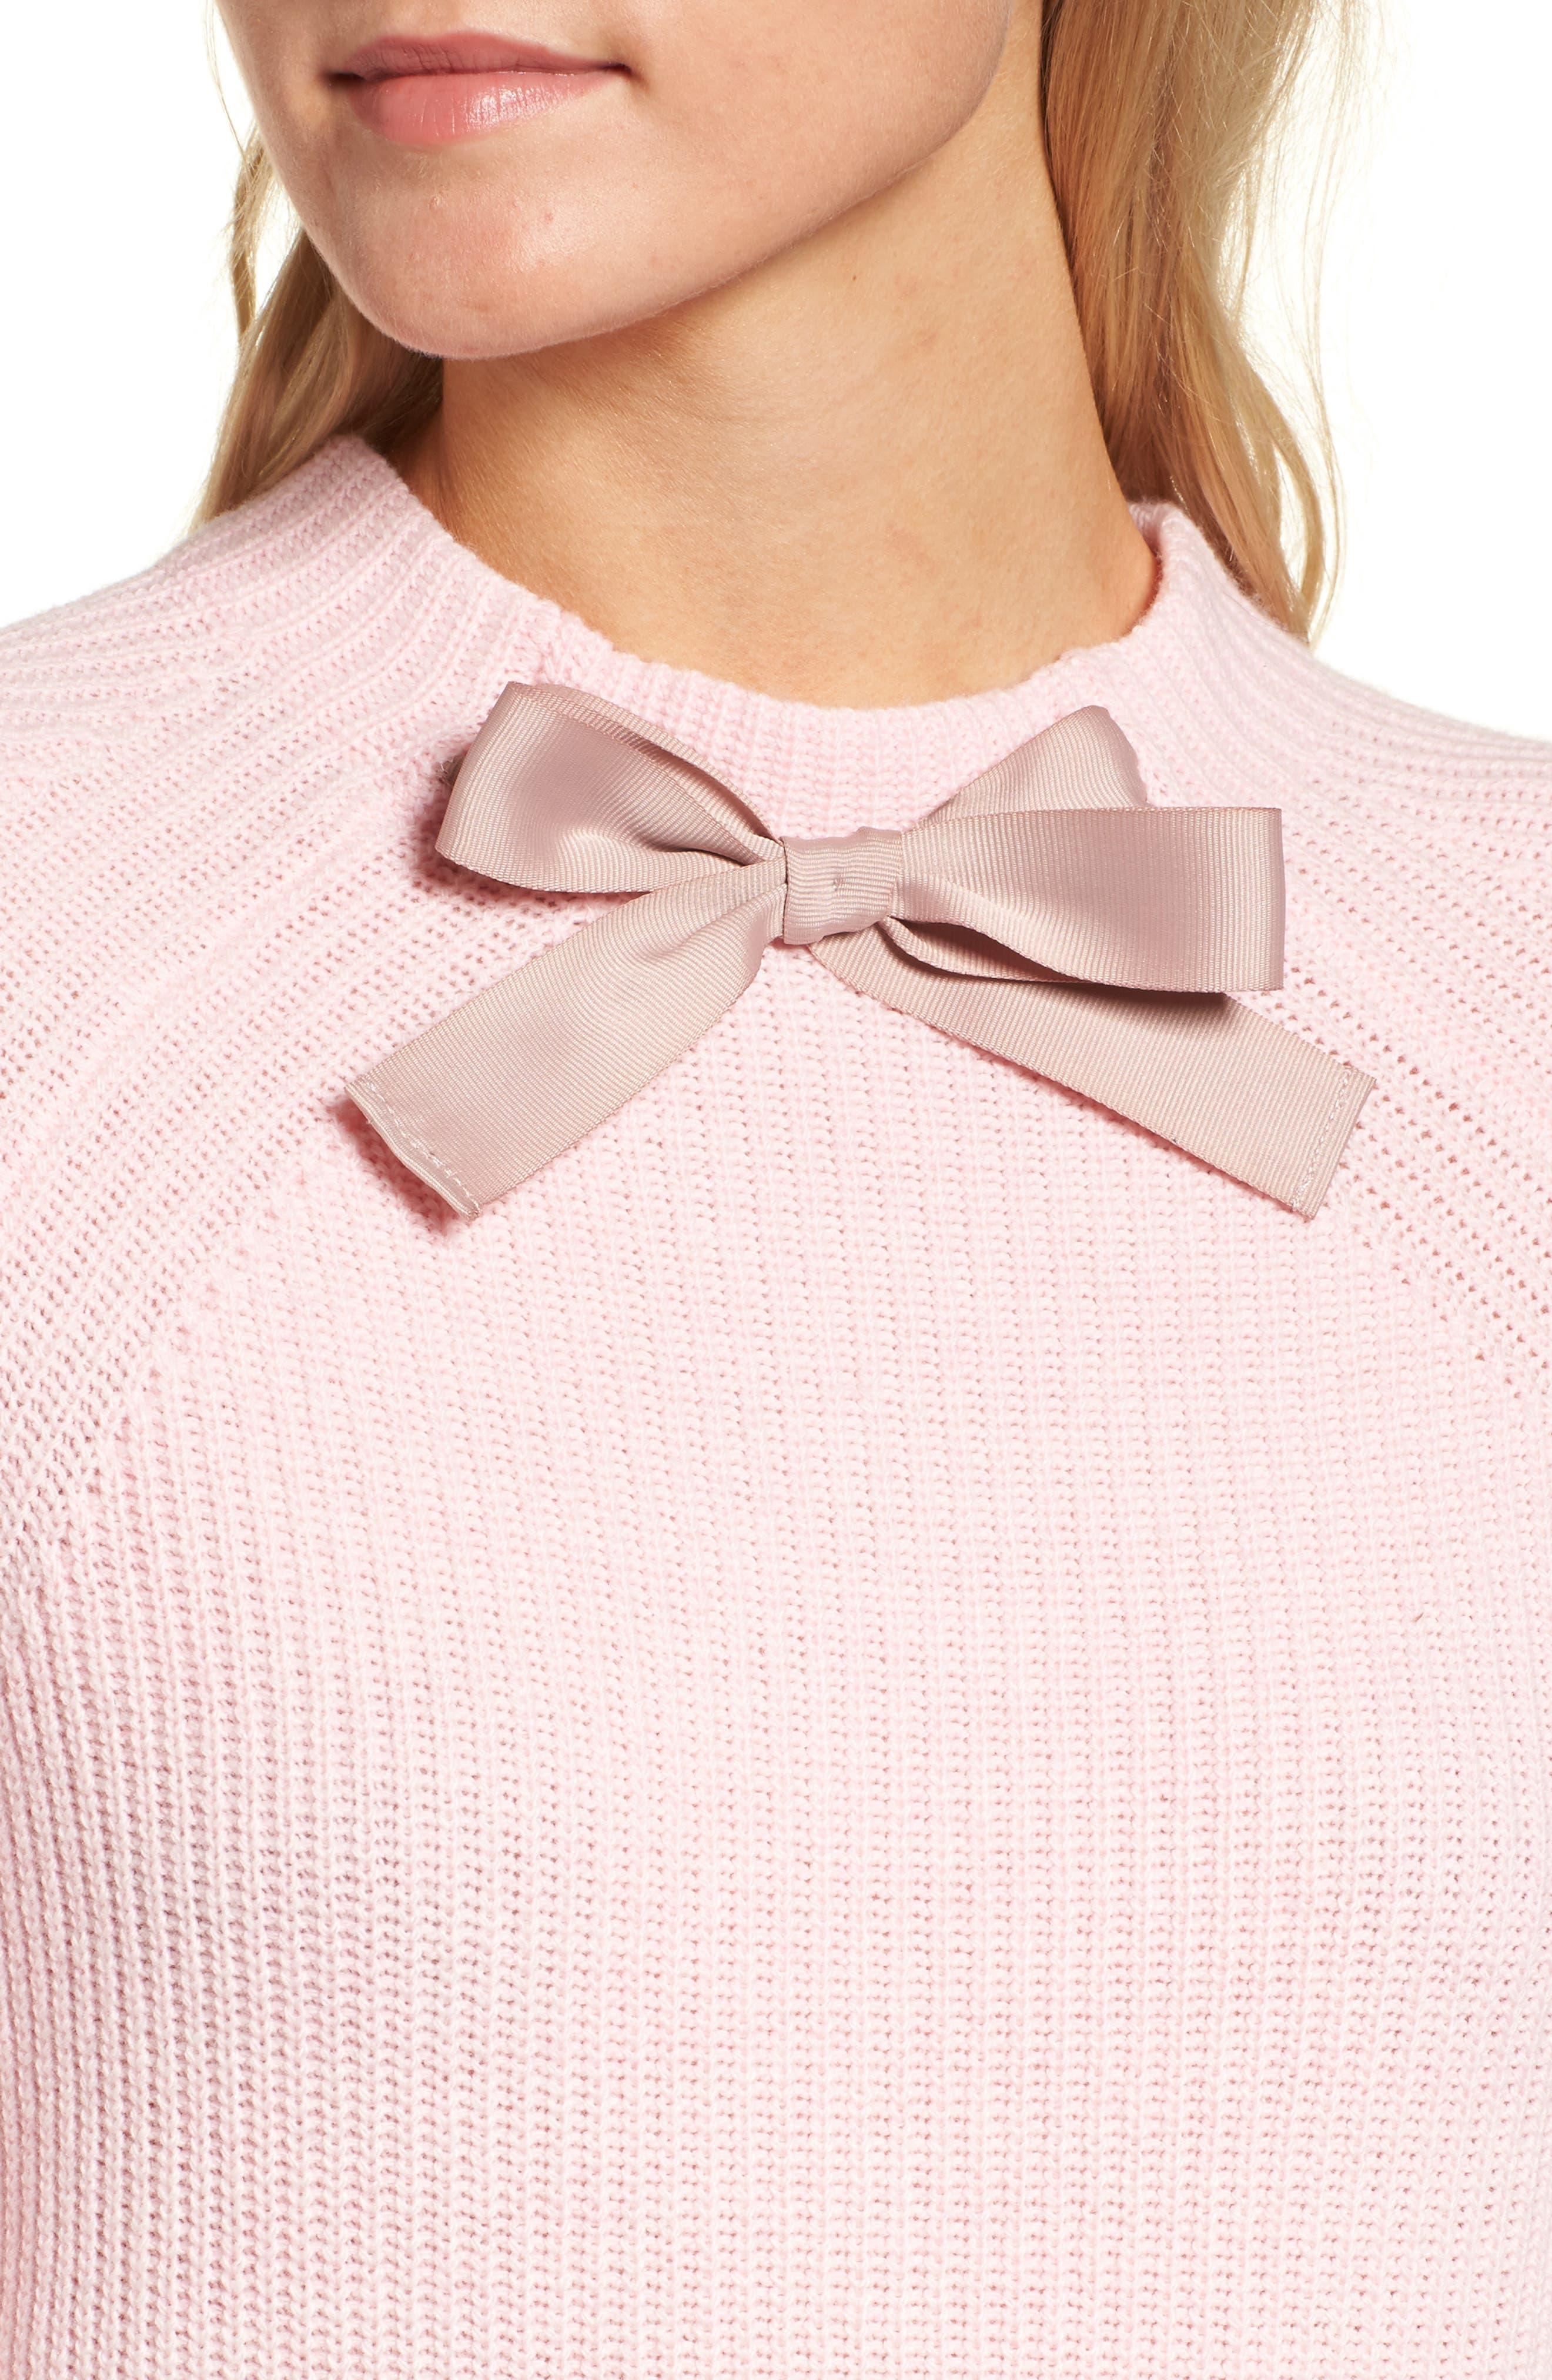 J.CREW,                             Gayle Tie Neck Sweater,                             Alternate thumbnail 4, color,                             650